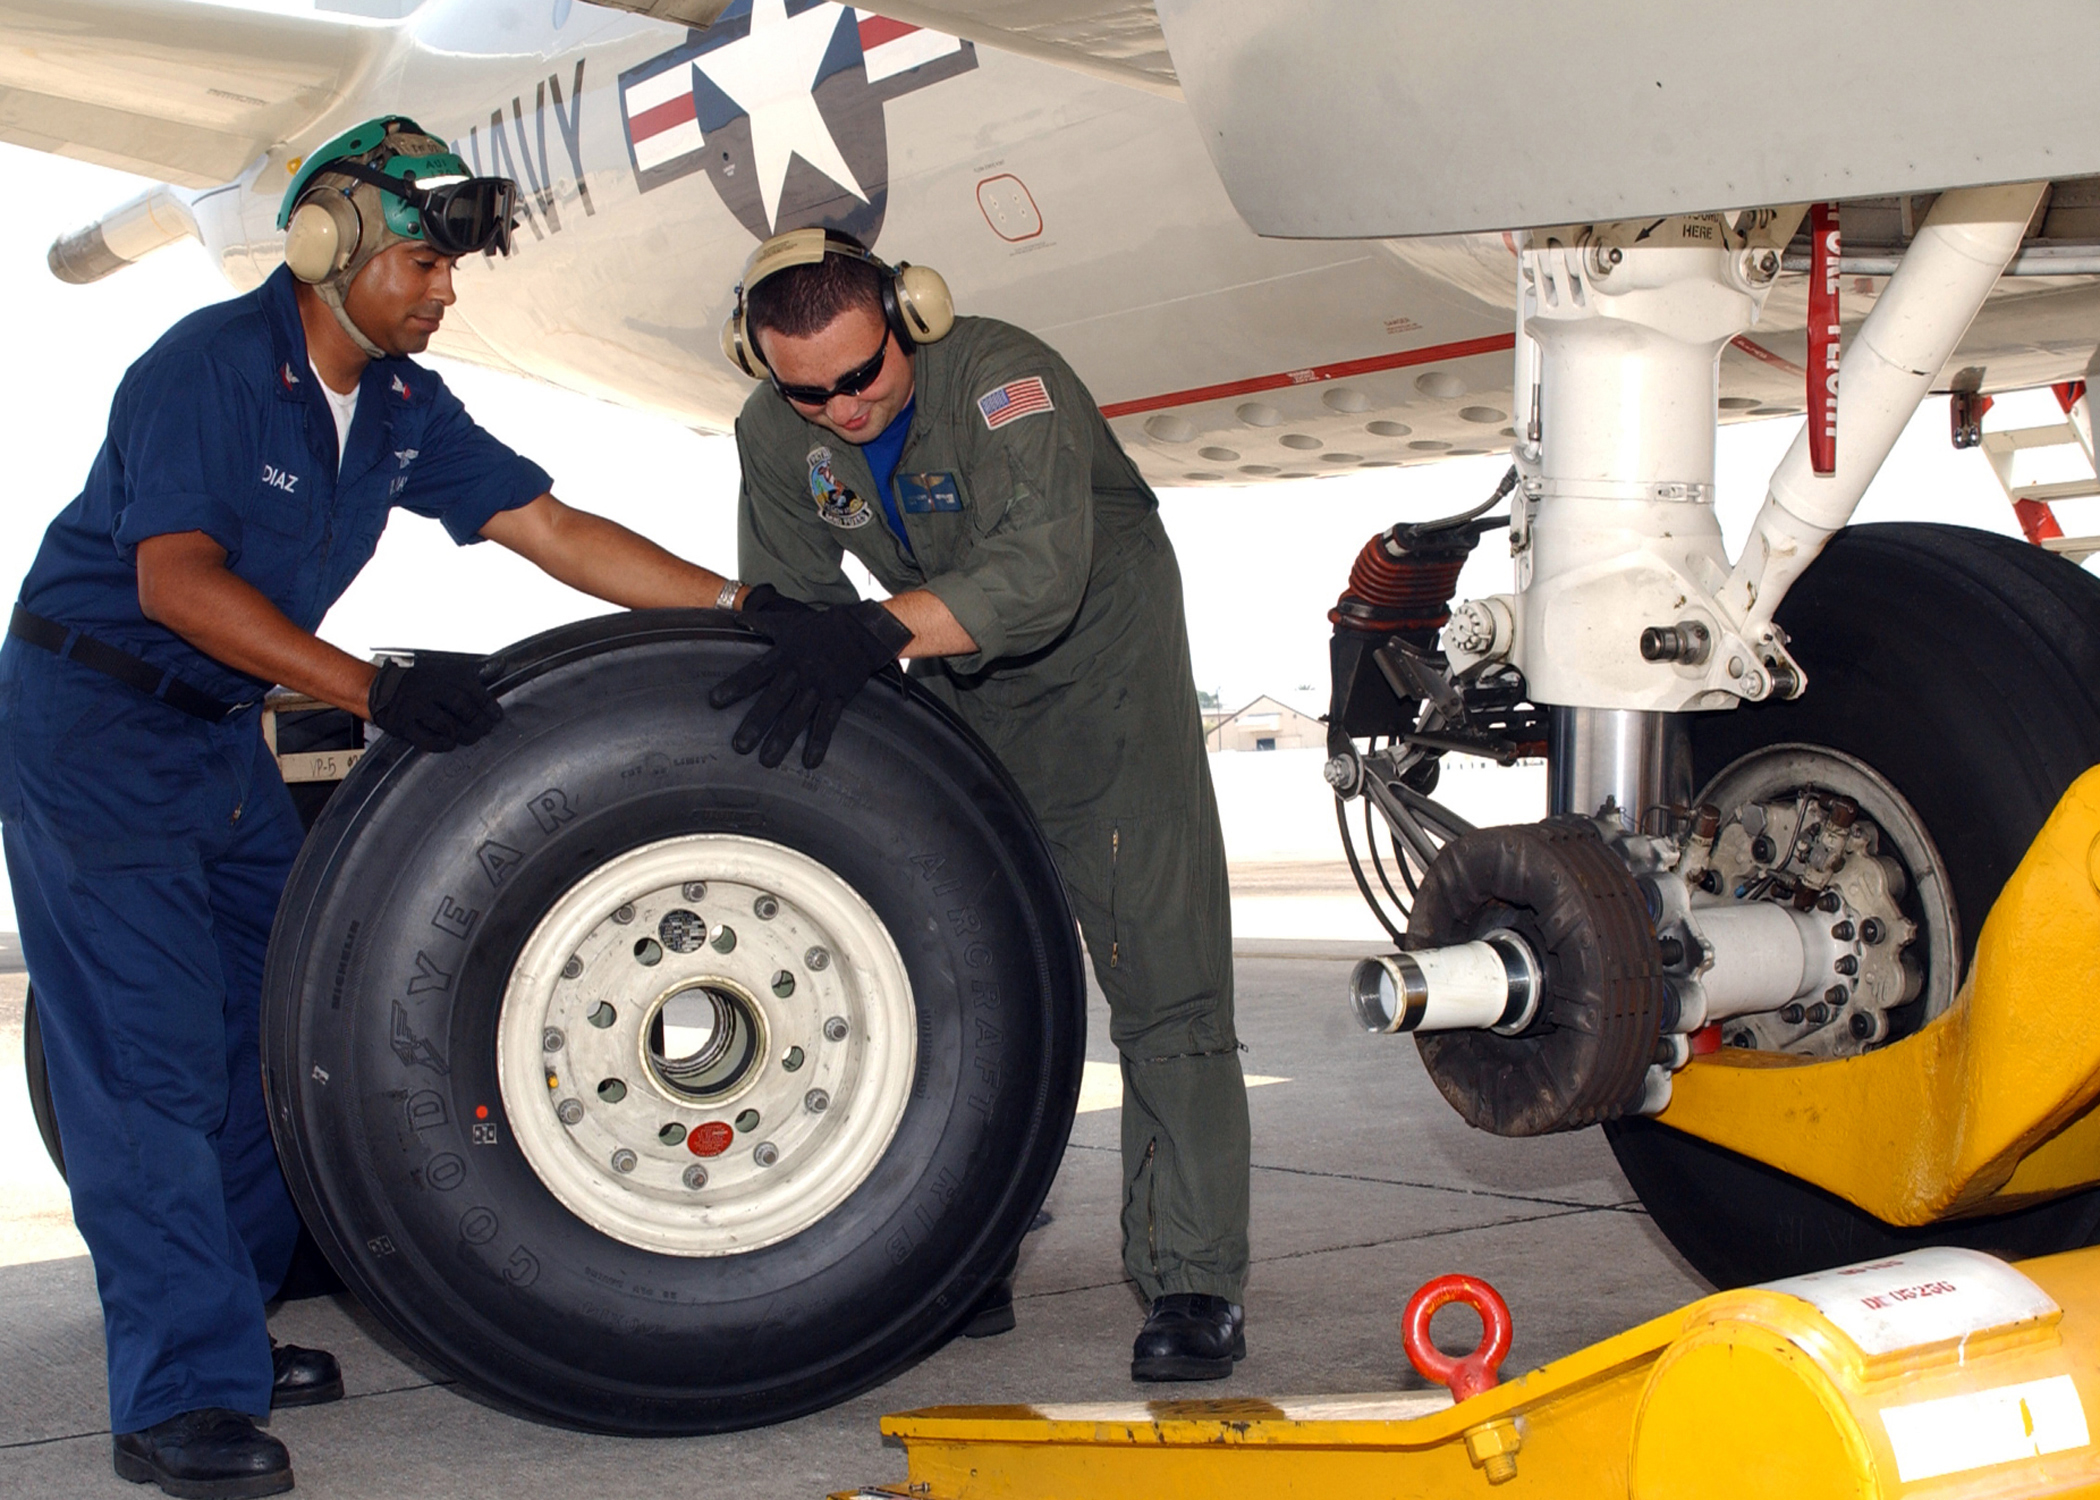 Description Two man replace a main landing gear tire of a plane.jpg